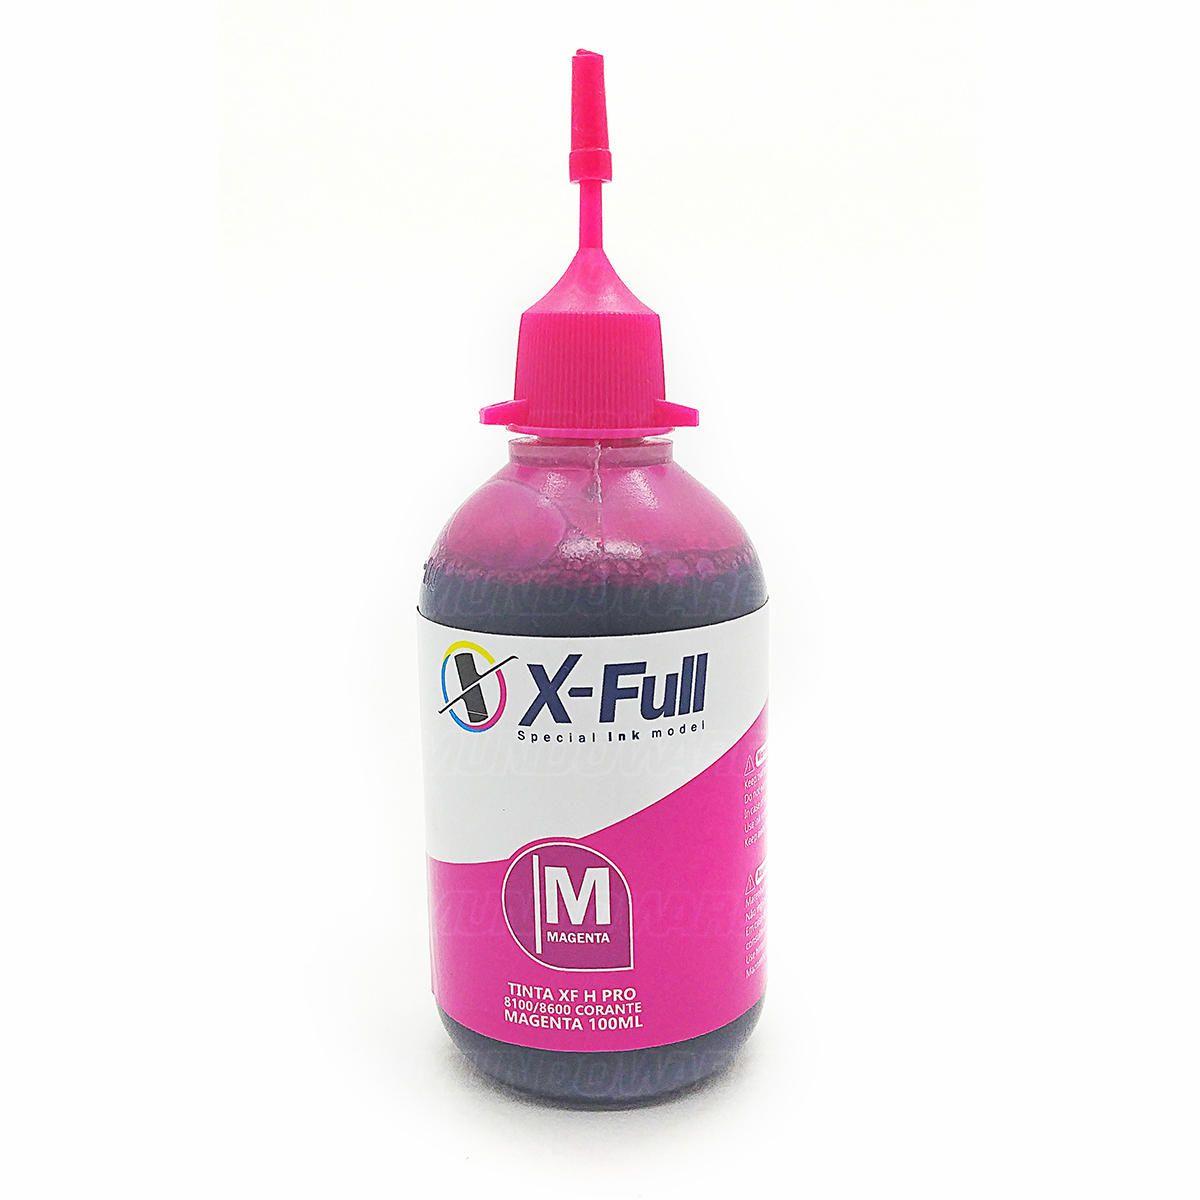 Compatível: Tinta Corante X-Full para HP 8600 8600w 8500 8100 8000 X576dw X551dw X476dw X451dw / Magenta / 100ml